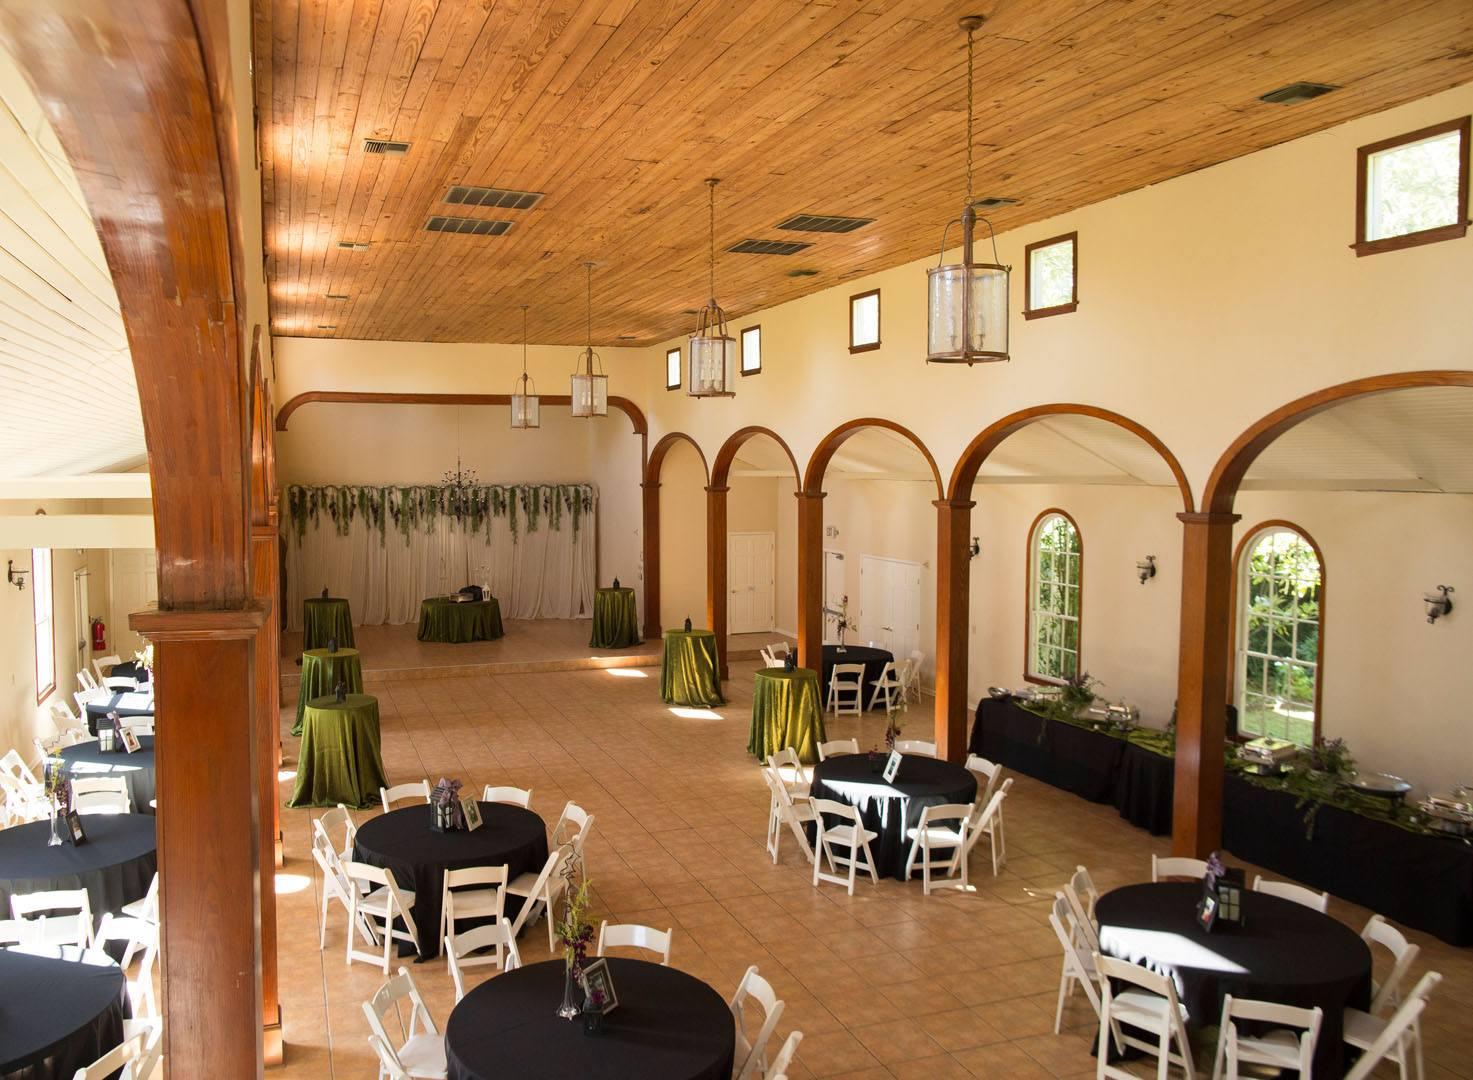 L'Eglise wedding venue photo of indoor wedding reception located near Lafayette, Louisiana